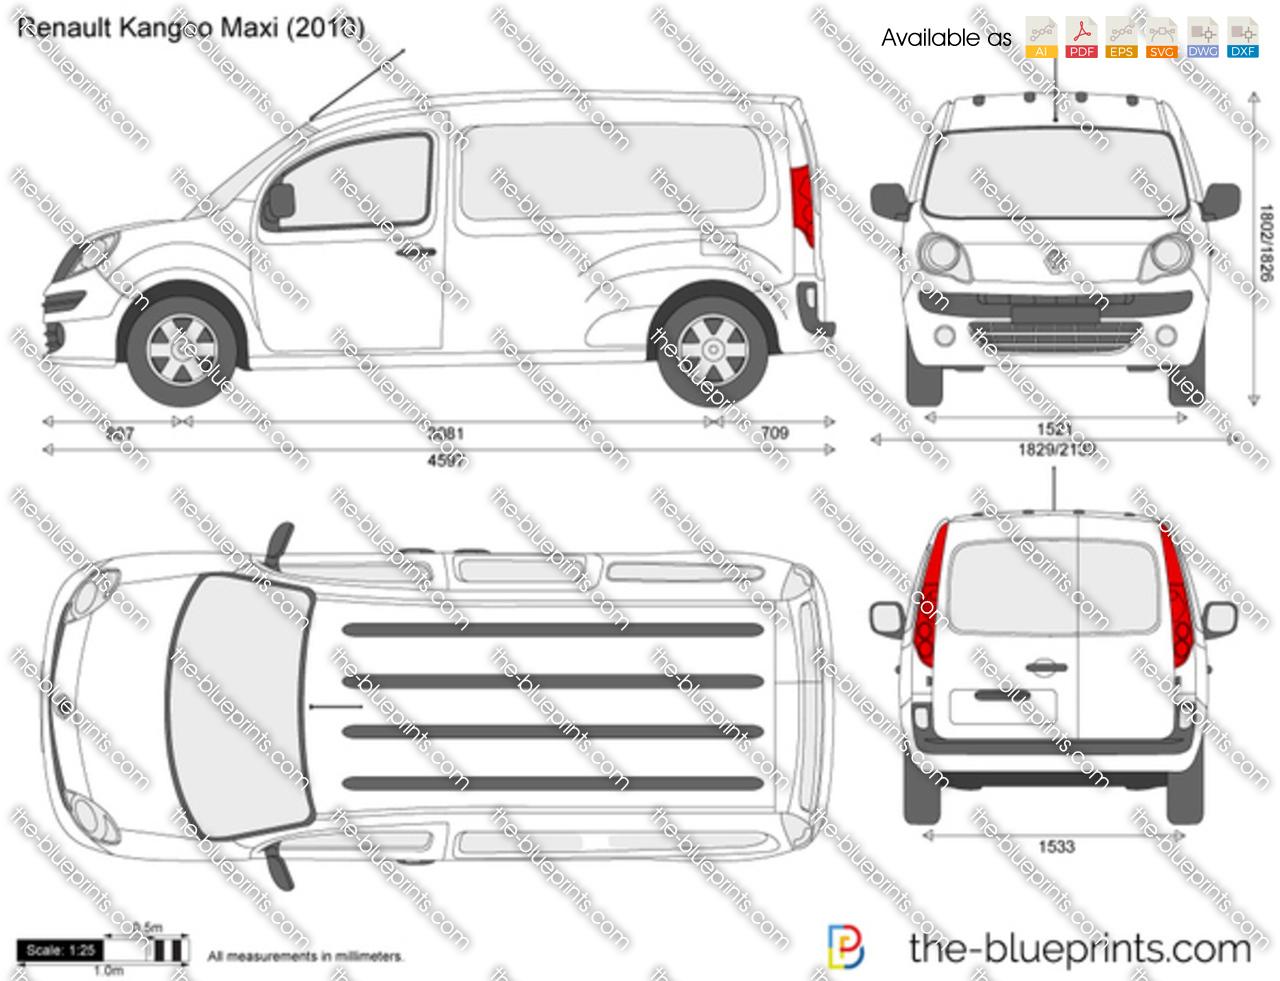 Renault Kangoo Maxi 2008